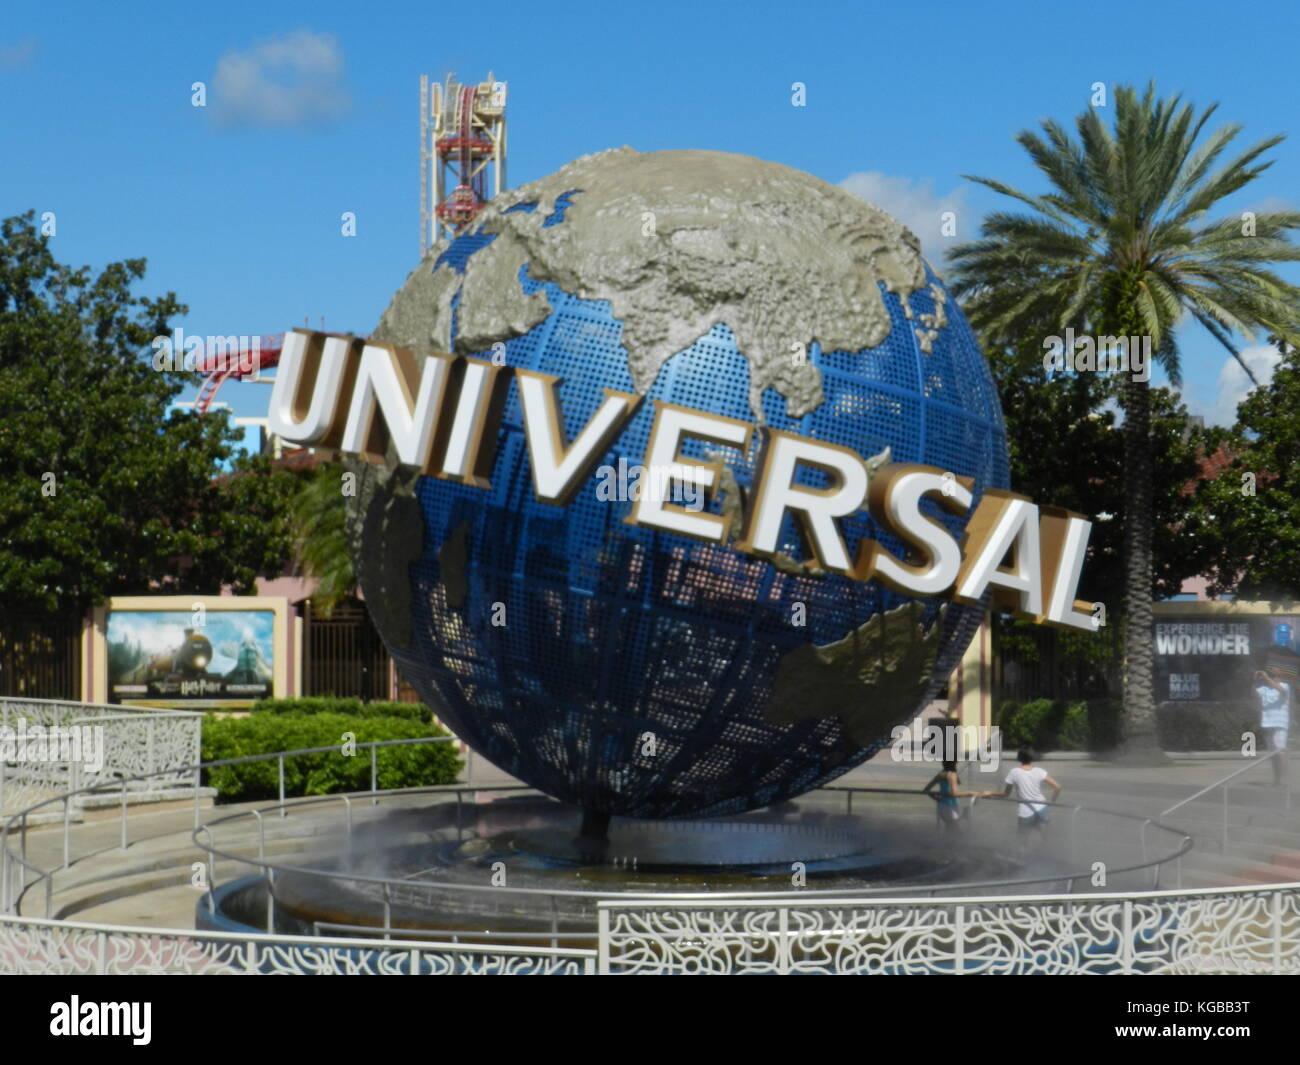 Large globe at Universal Studios, Orlando,Florida - Stock Image